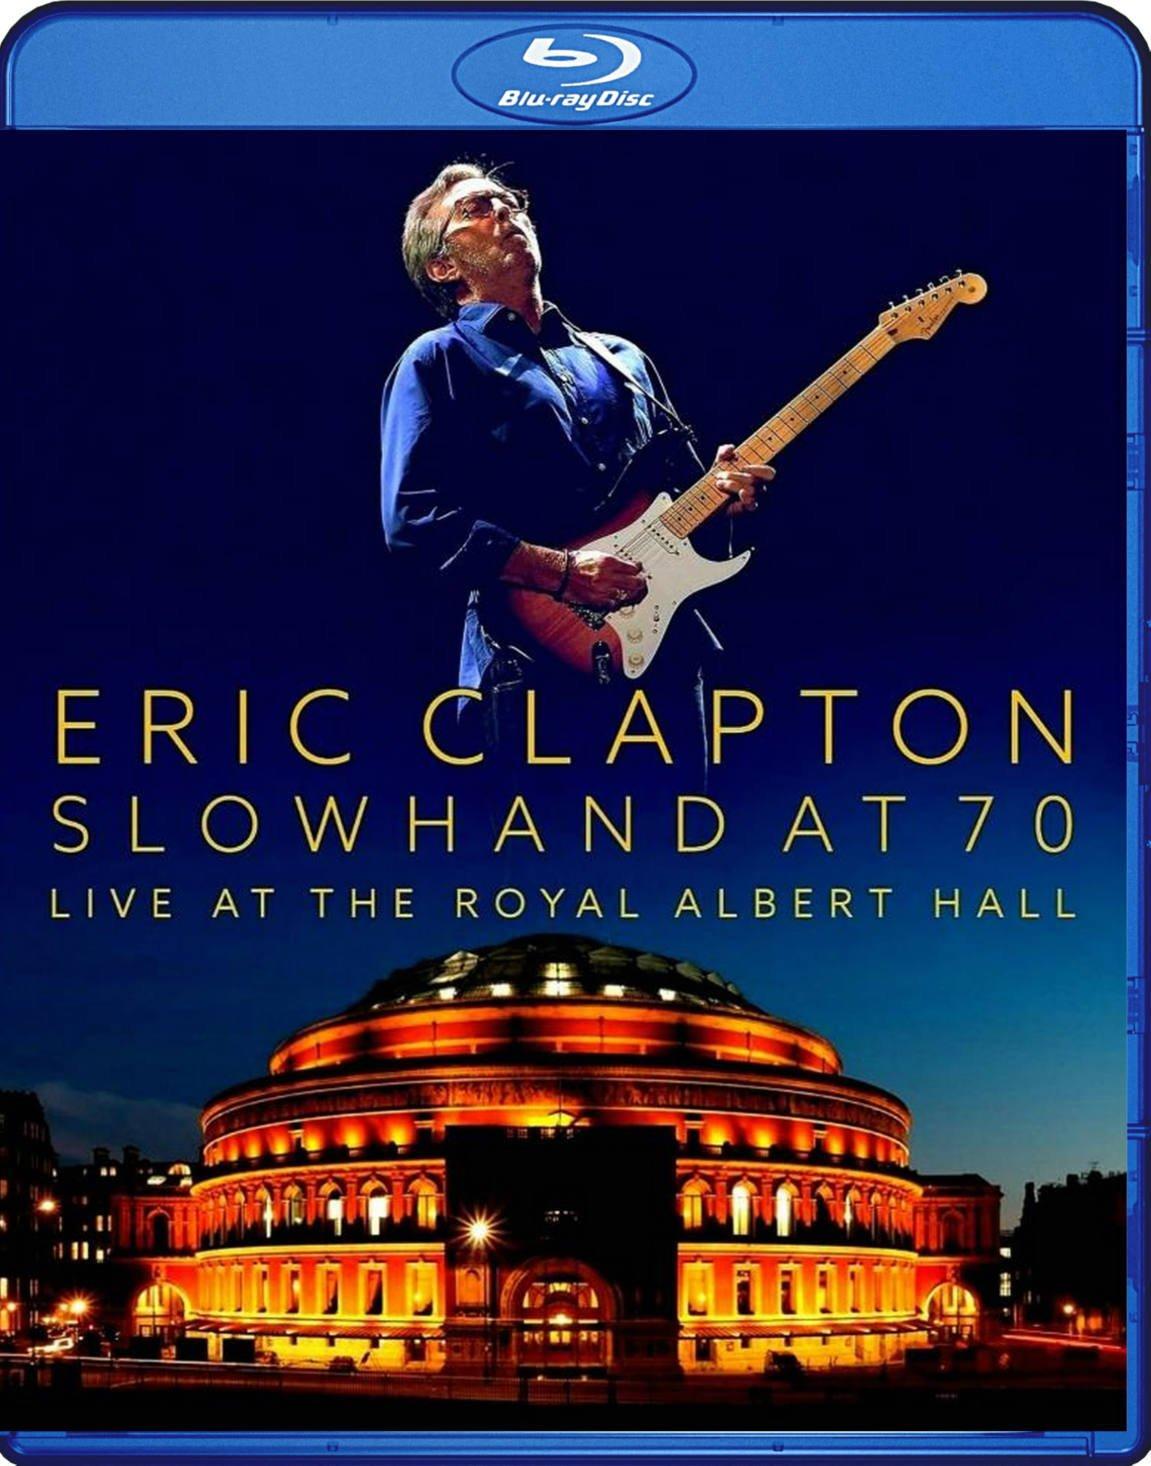 Eric Clapton Slowhand At 70 Live At The Royal Albert Hall Blu-Ray